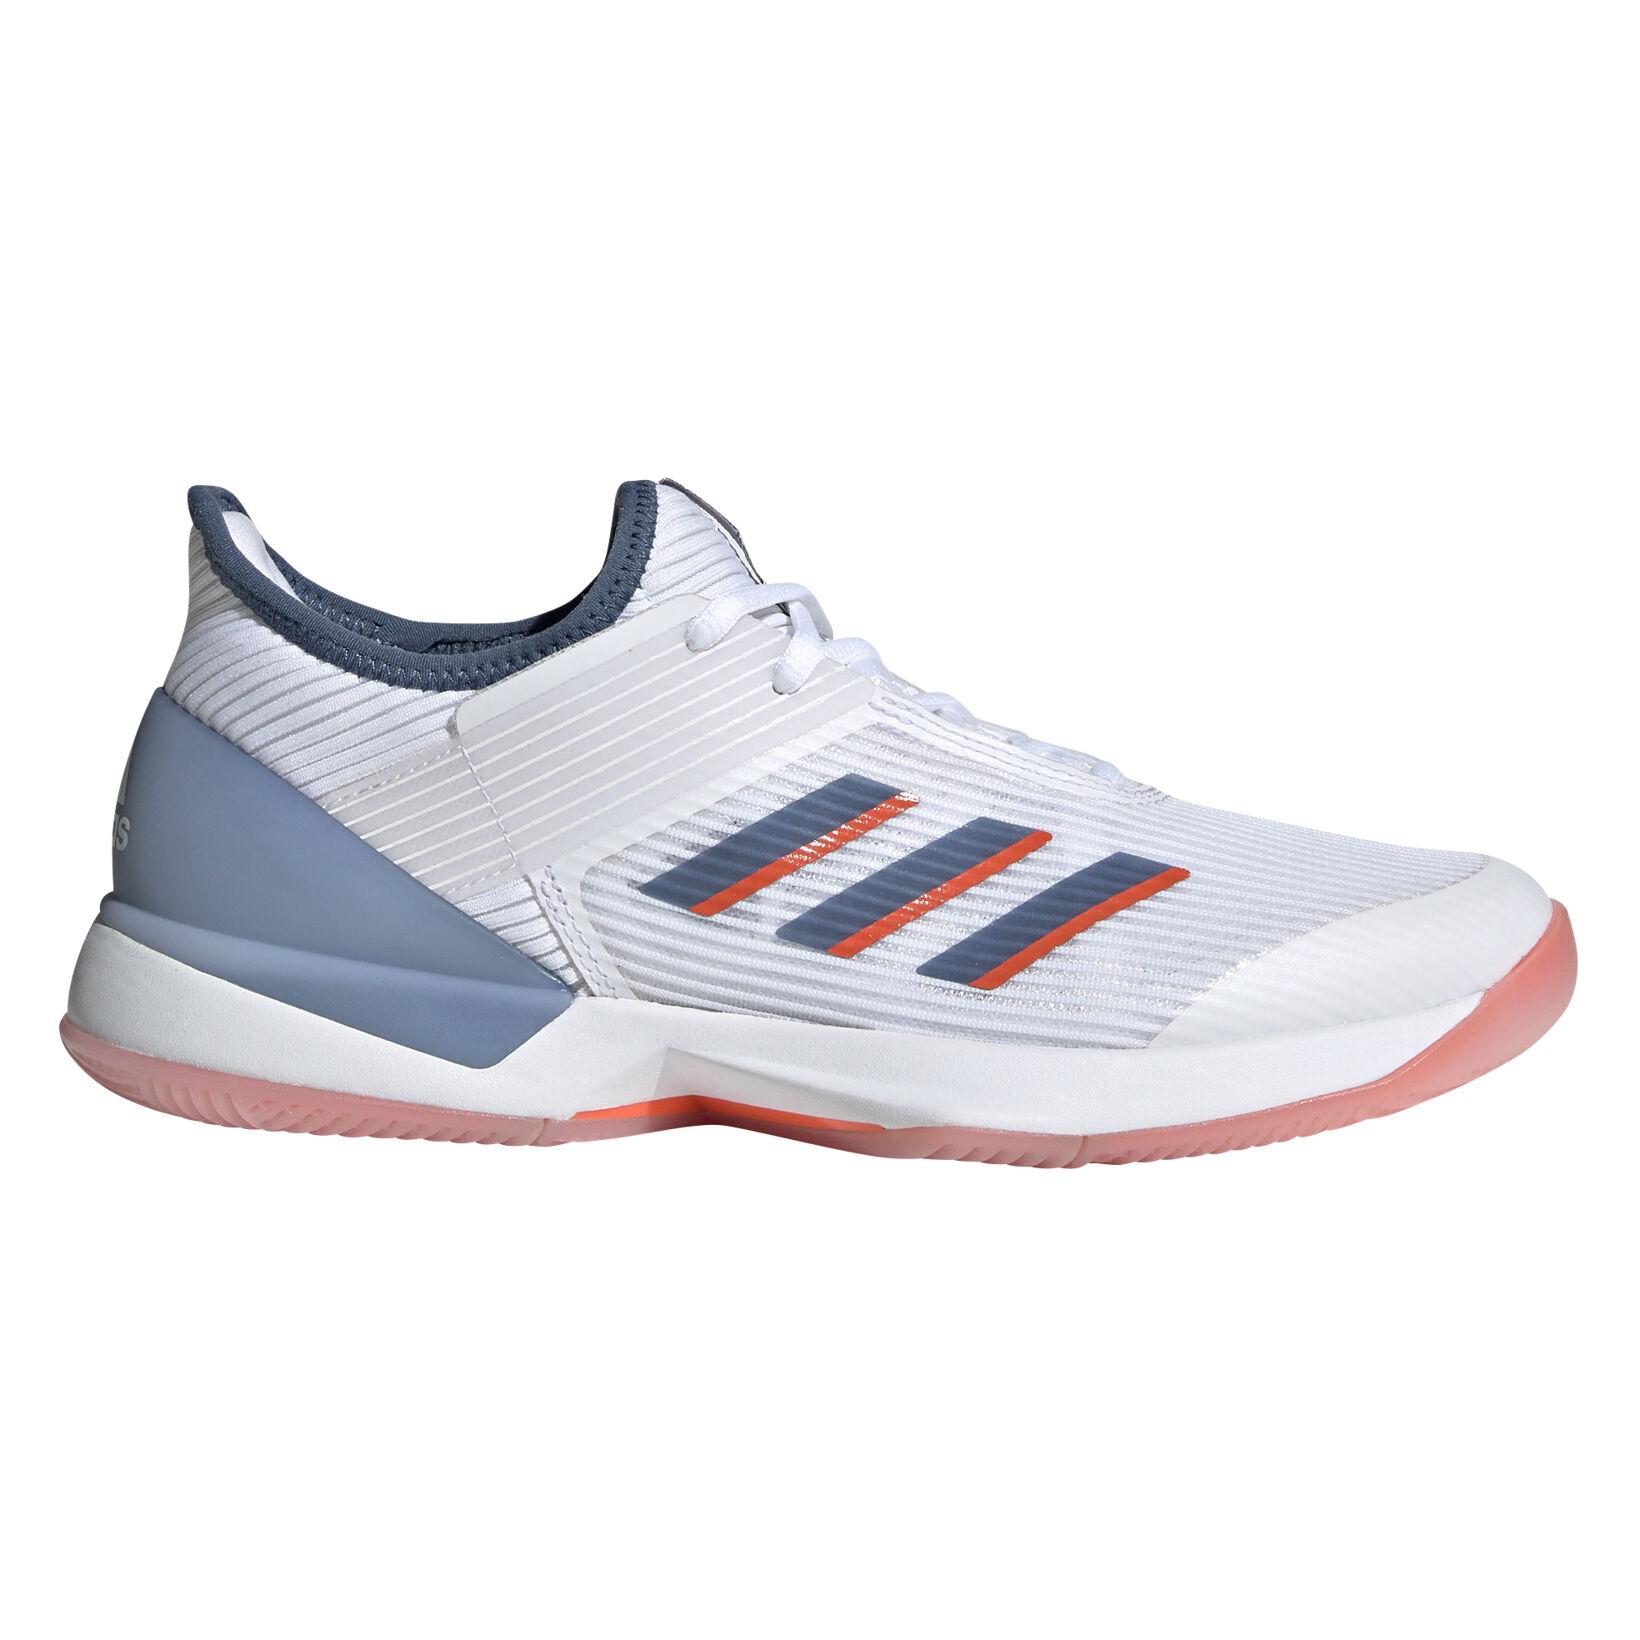 buy adidas Adizero Ubersonic 3 All Court Shoe Special